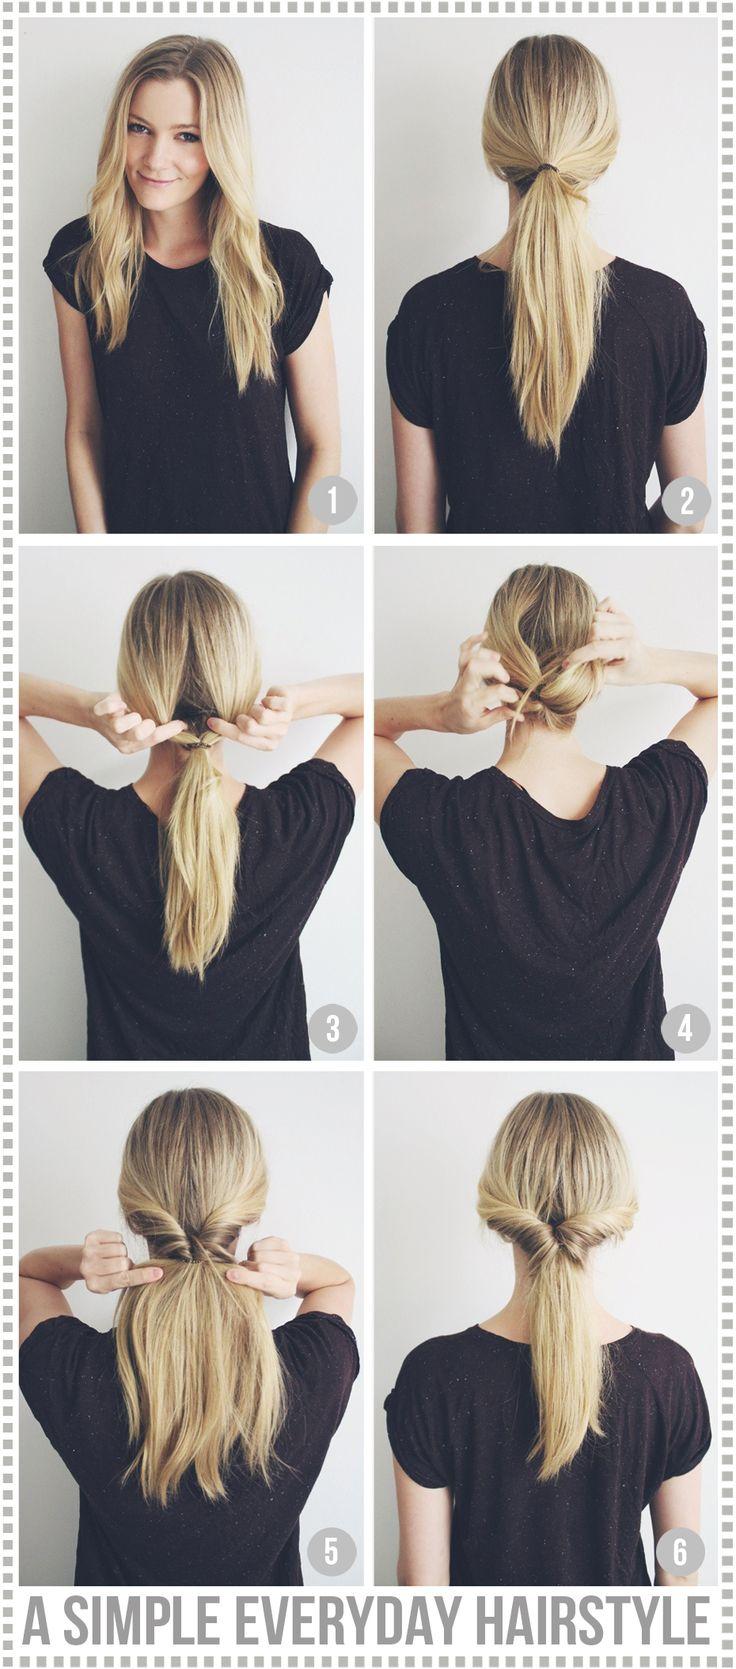 Peachy 1000 Images About Peinados On Pinterest Braids Dakota Johnson Short Hairstyles For Black Women Fulllsitofus